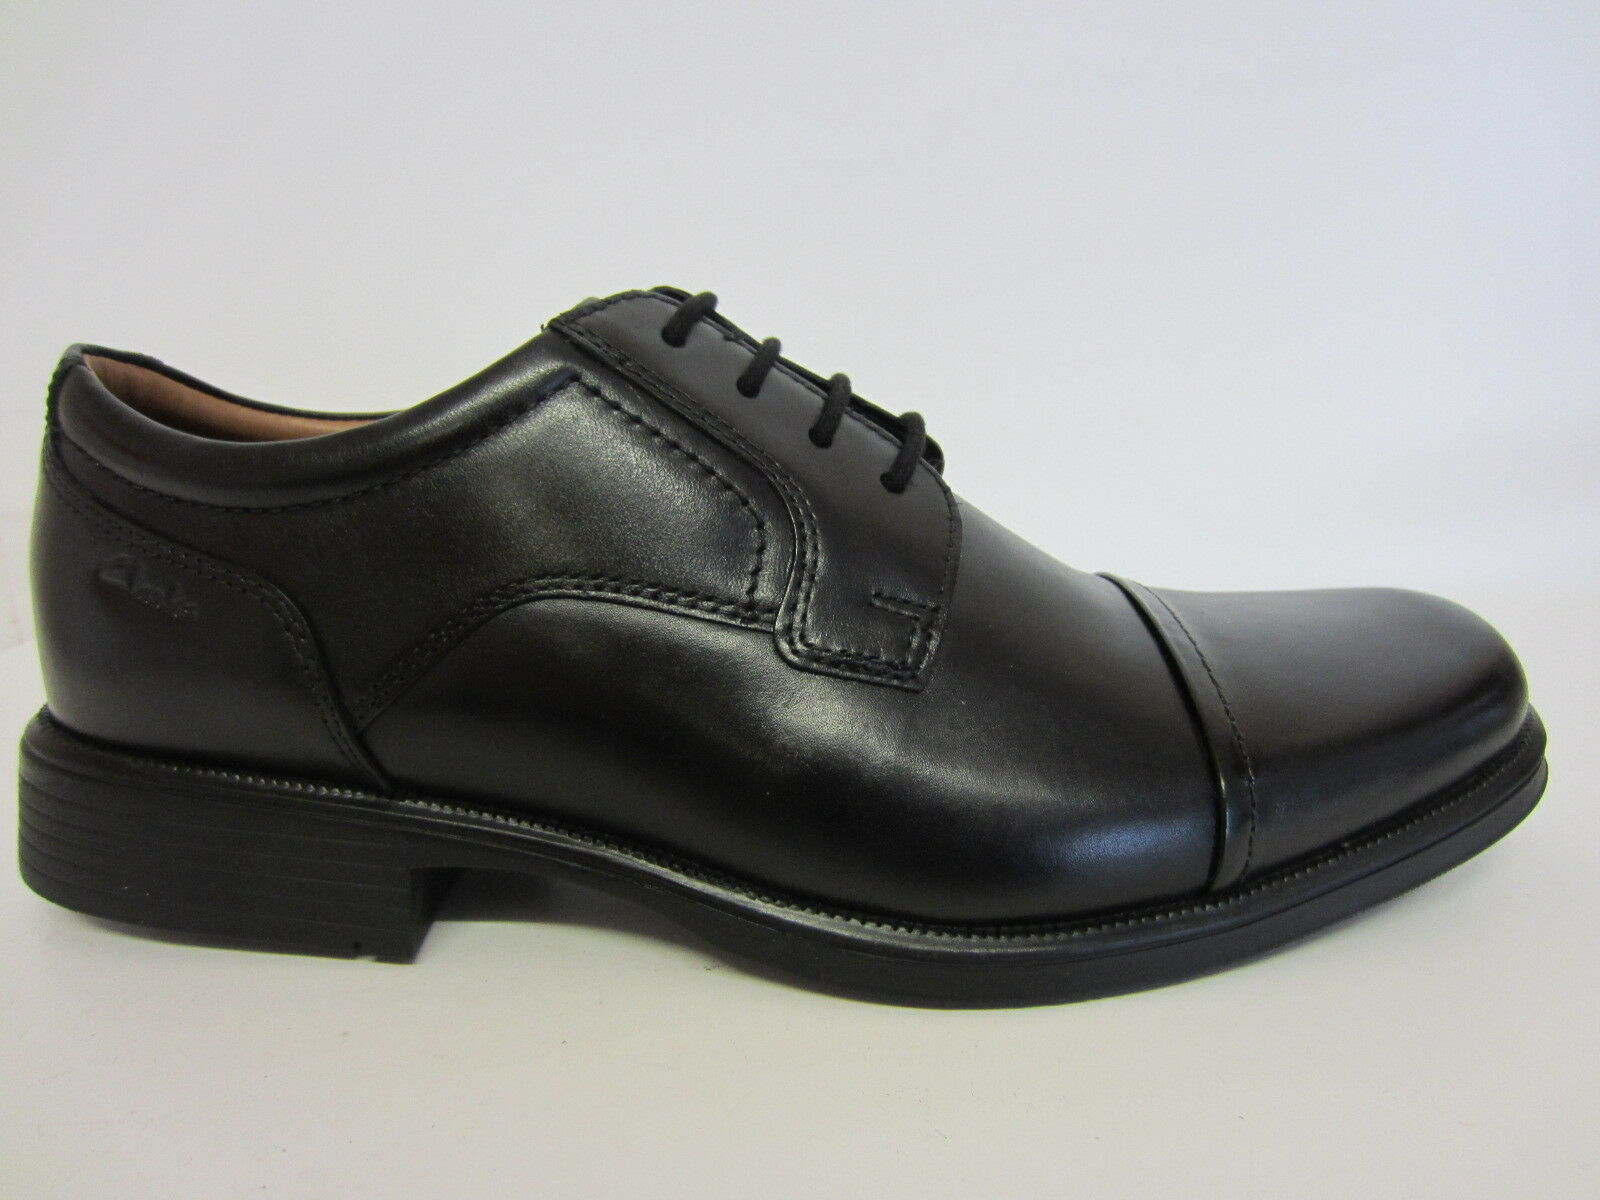 Clarks Huckley Kappe Herren Schwarze & Leder Schuhe G Passform Größen 8.5 & Schwarze 9.5 59e9a9